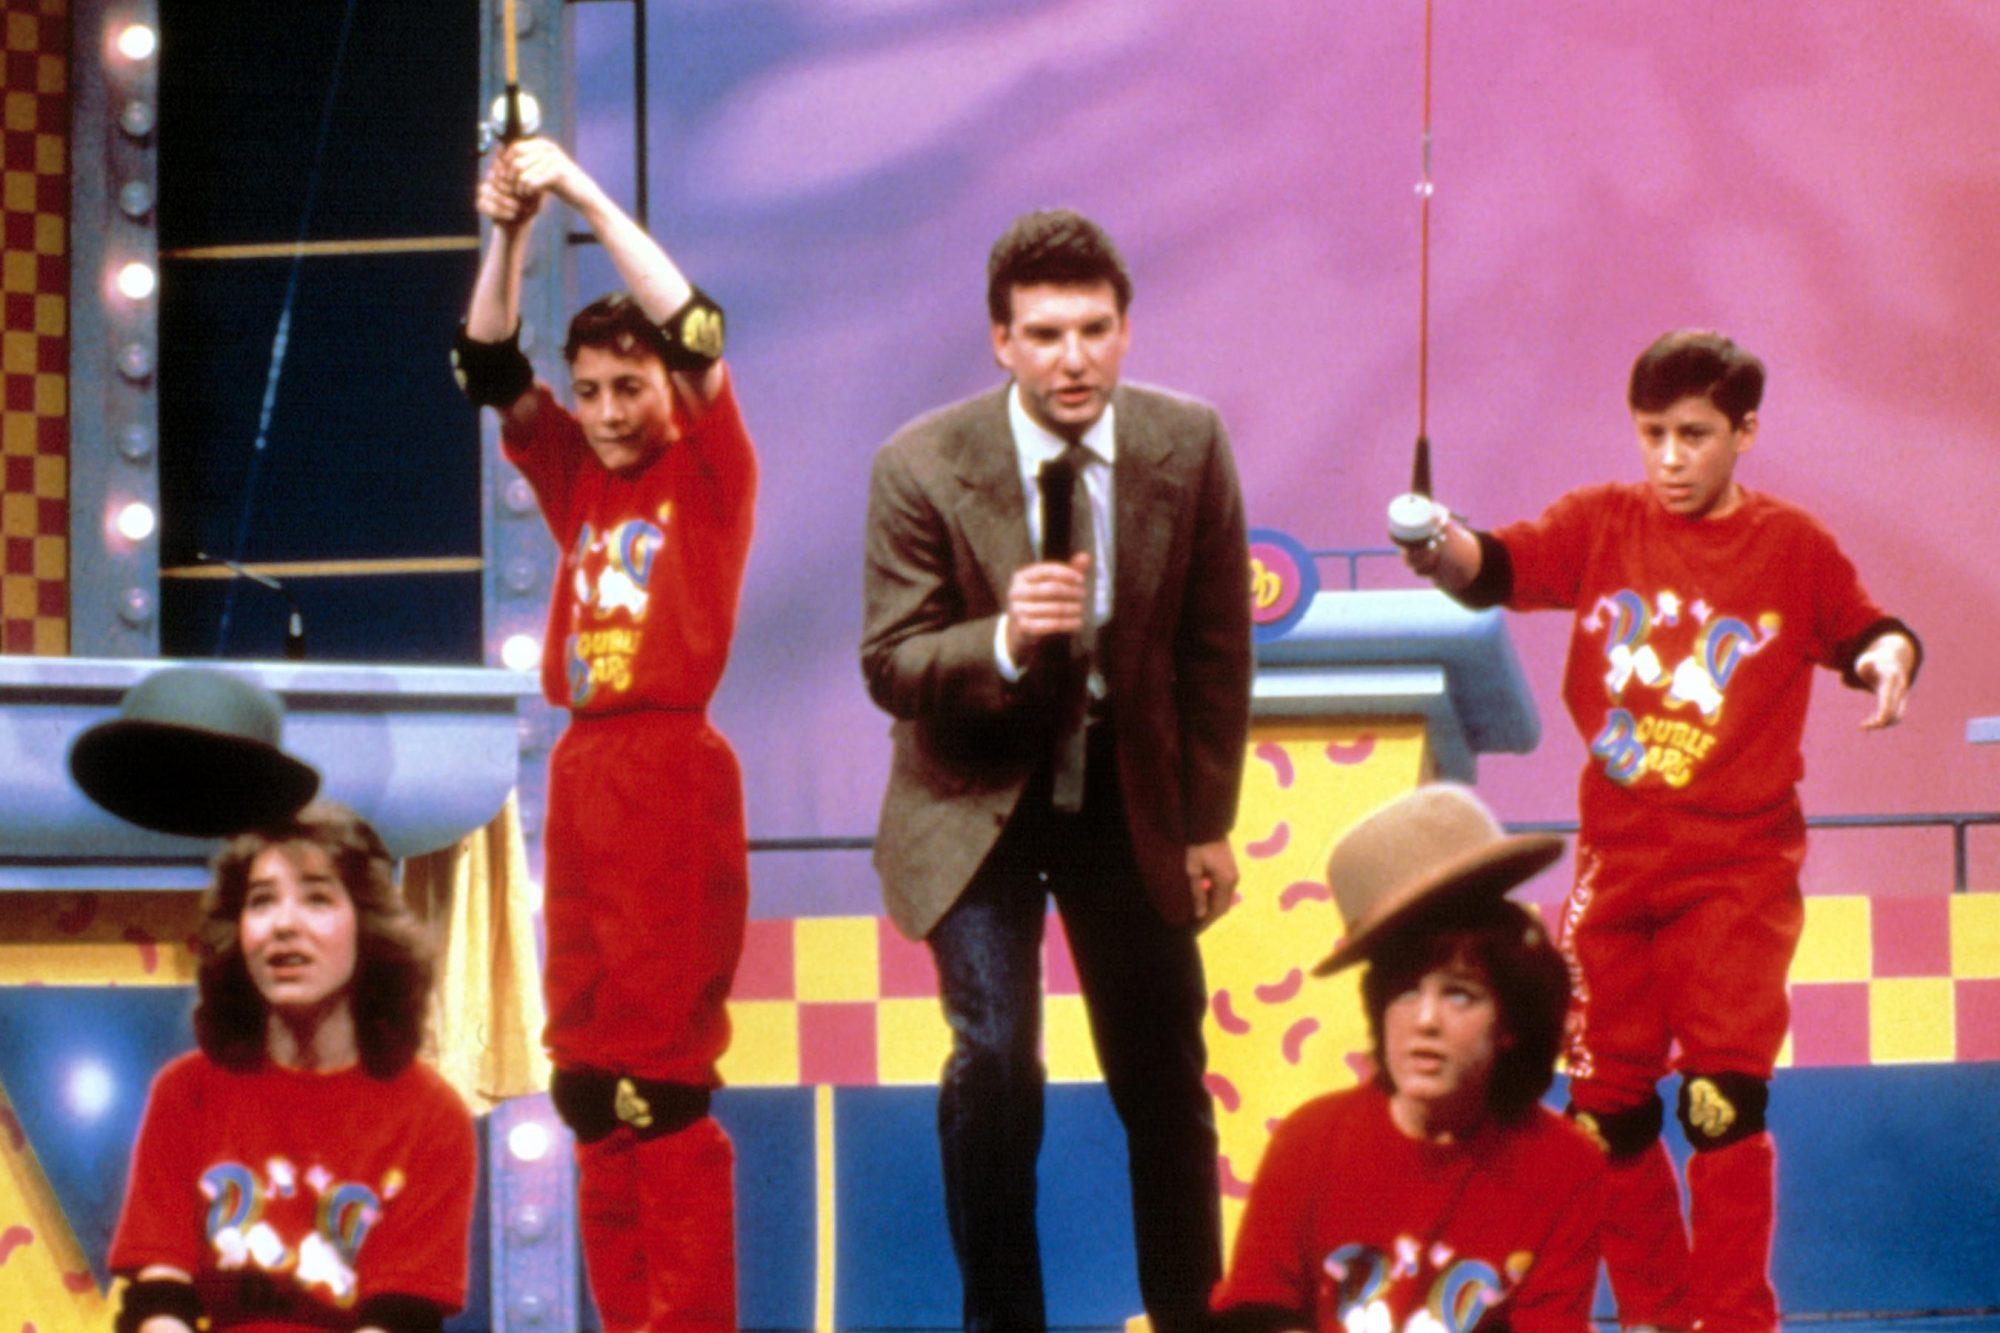 DOUBLE DARE, Host Marc Summers w/ contestants, circa 1986, 1986-present